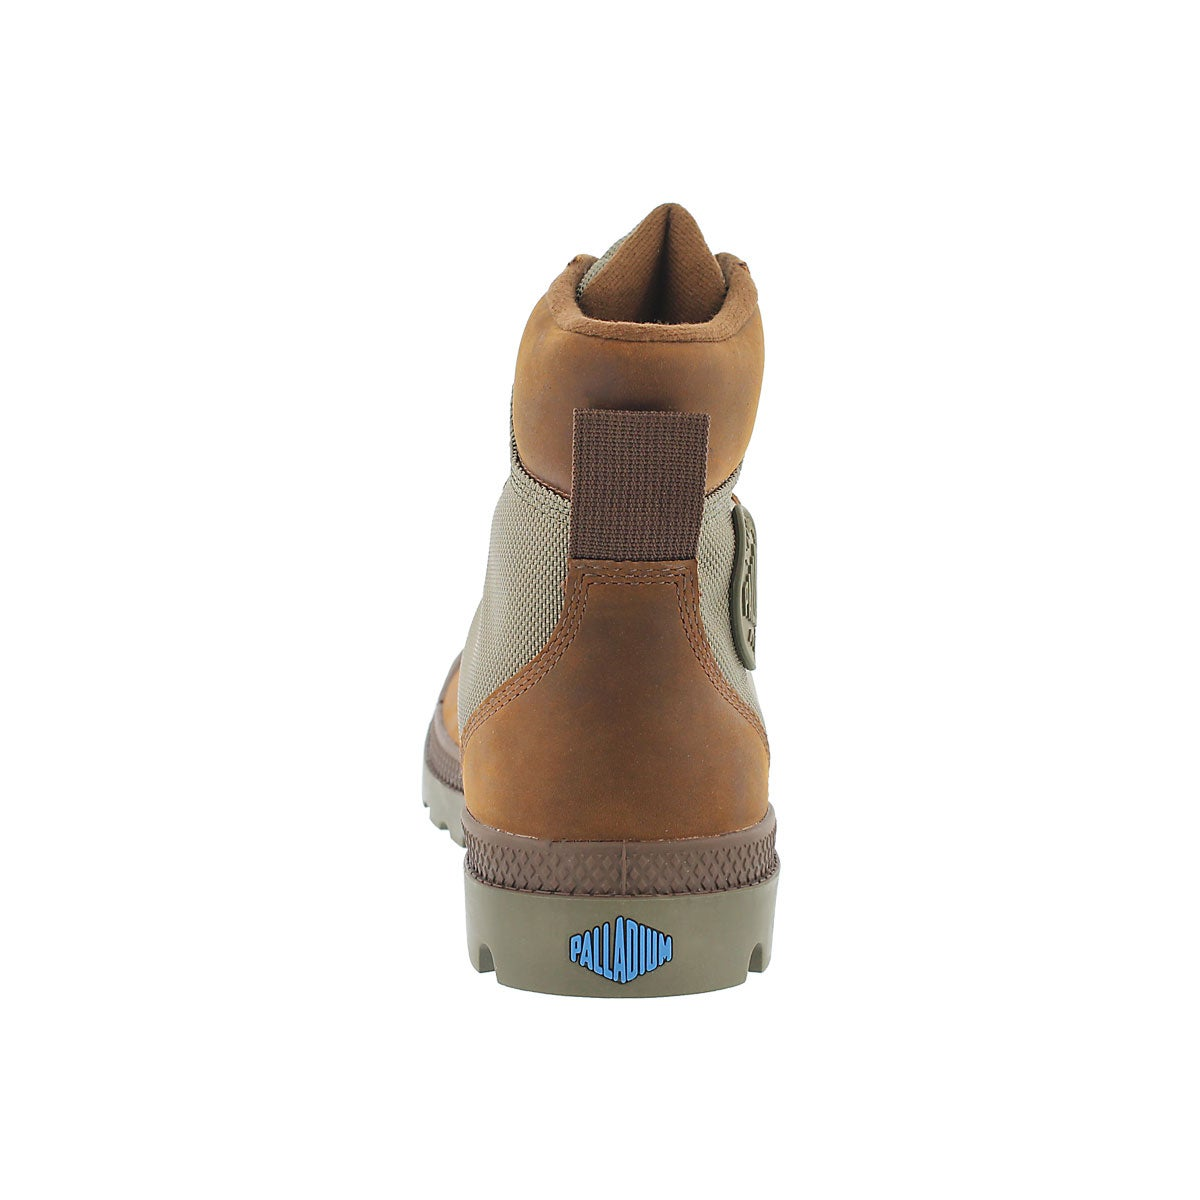 Mns Pampa Sport Cuff brown wtrprf boot